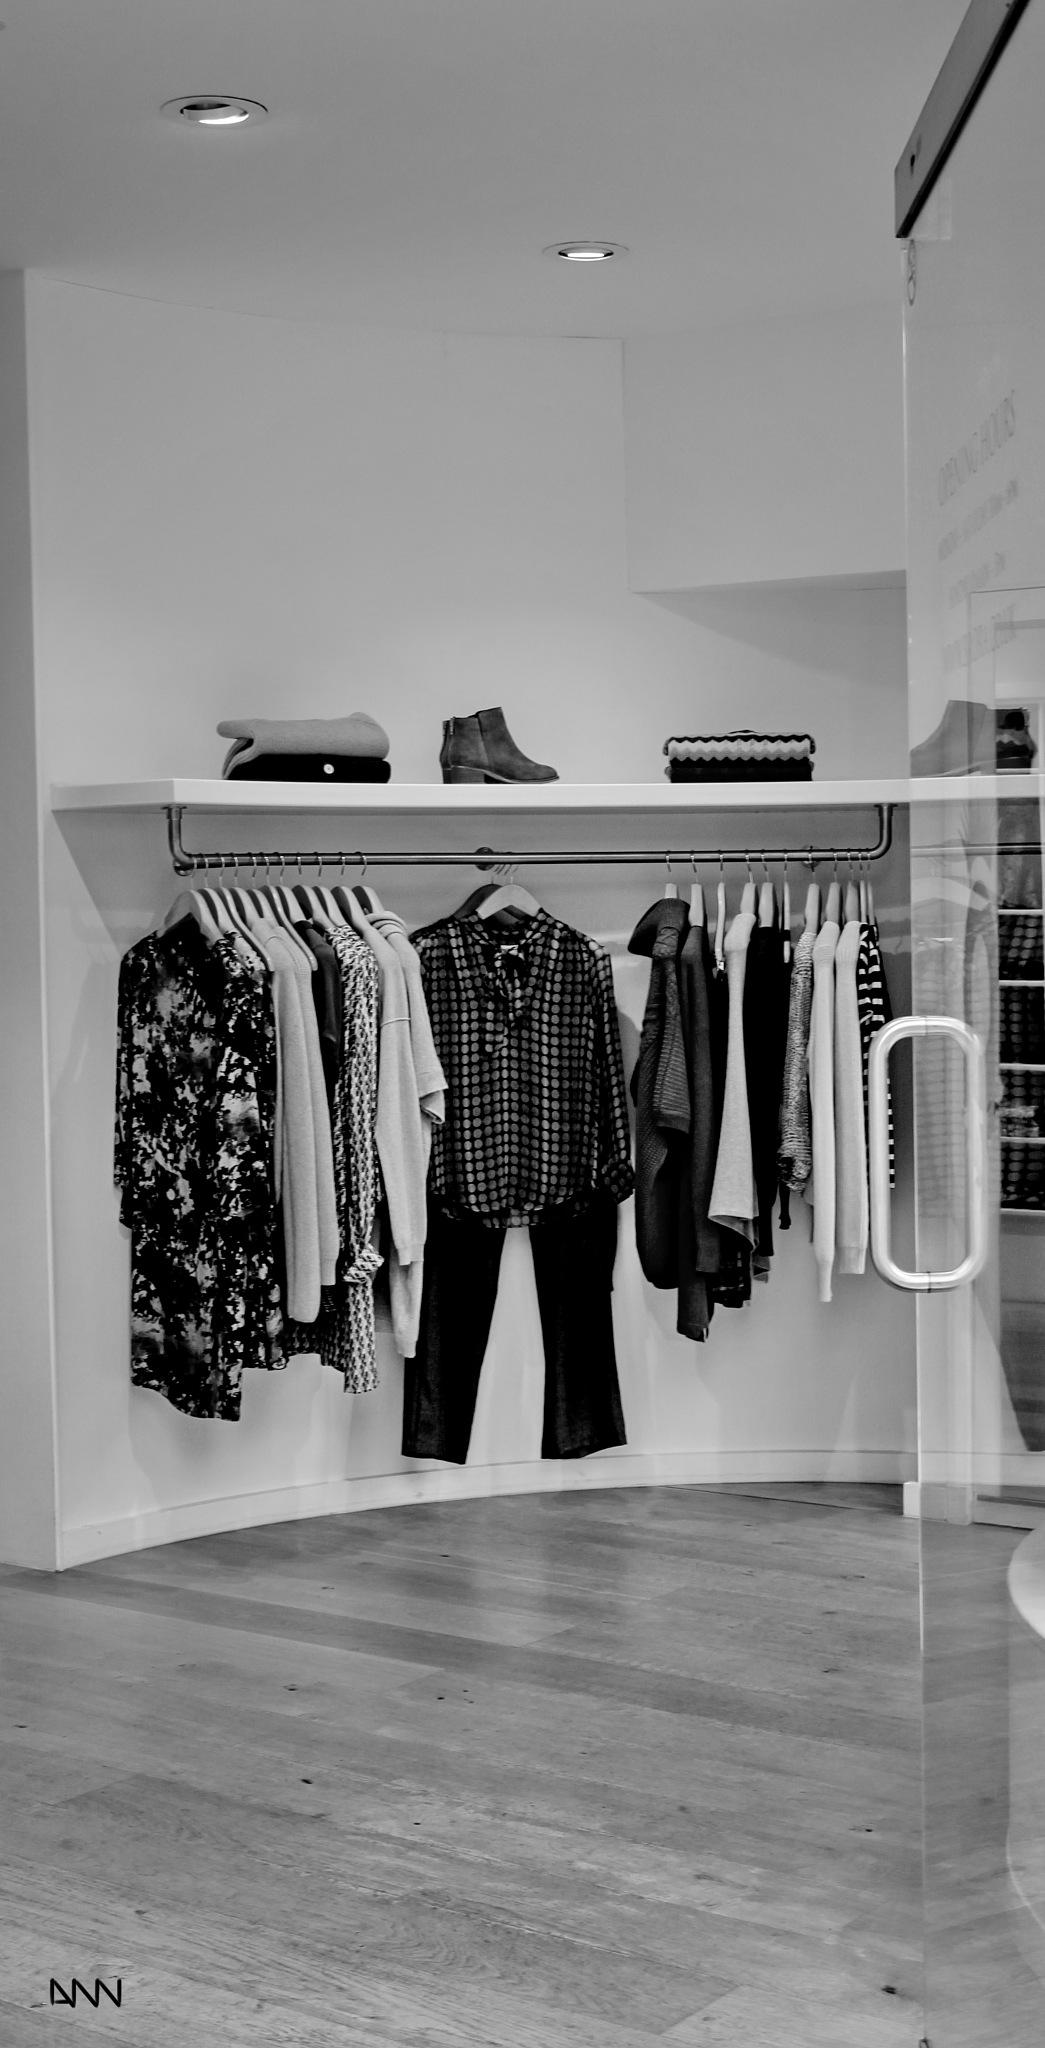 ... clothes by Anton Nistor Nicolae